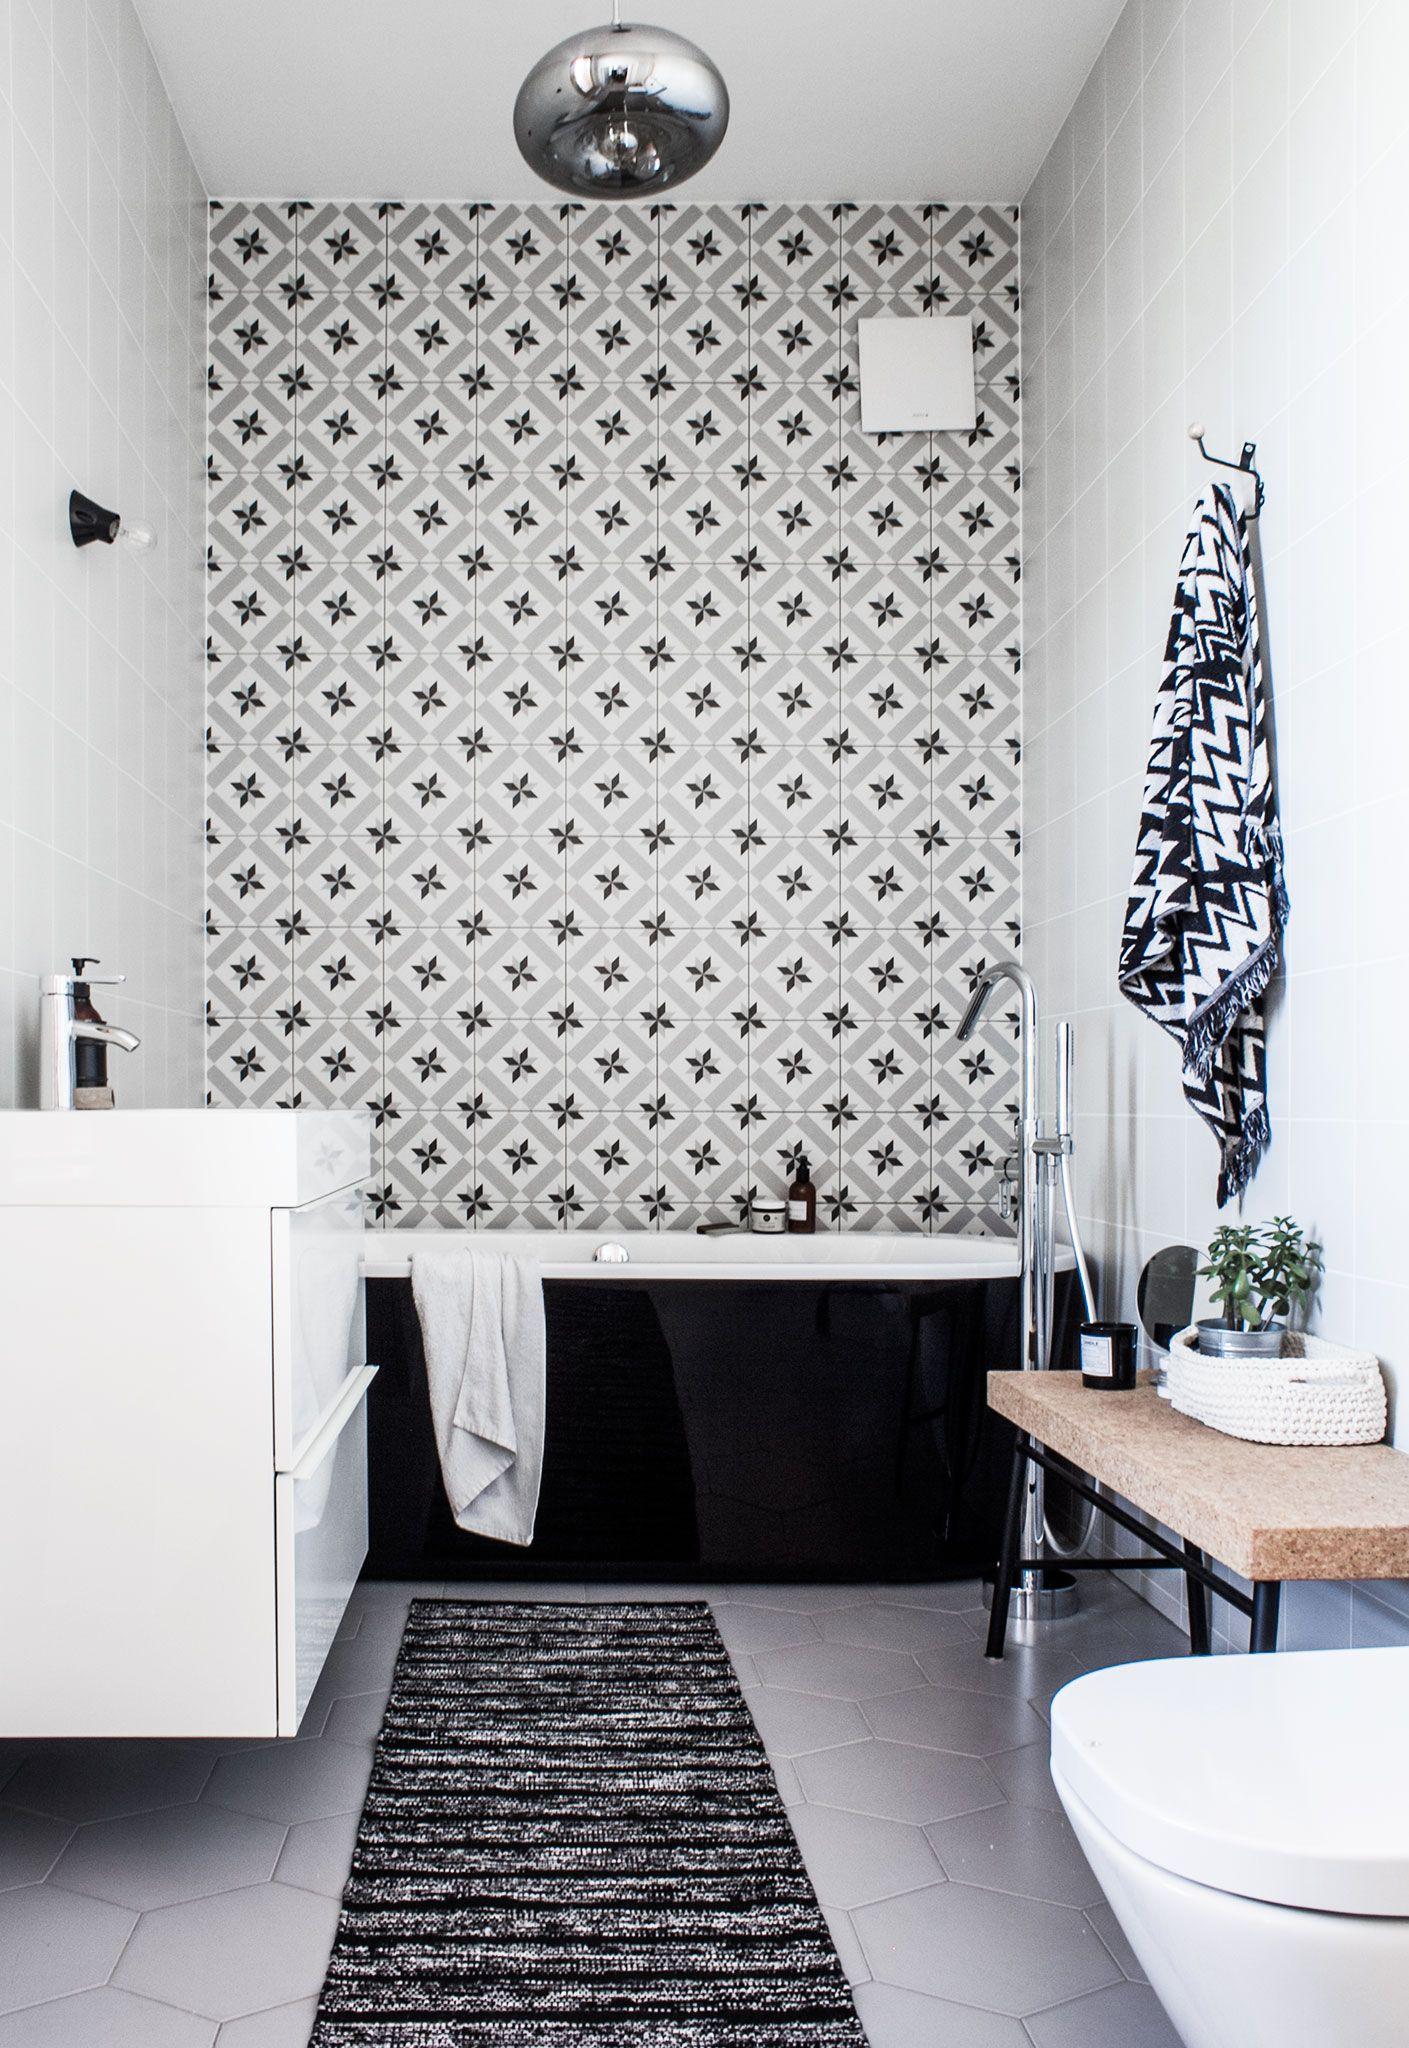 12 Ideas For Designing An Art Deco Bathroom | Pinterest | Art deco ...